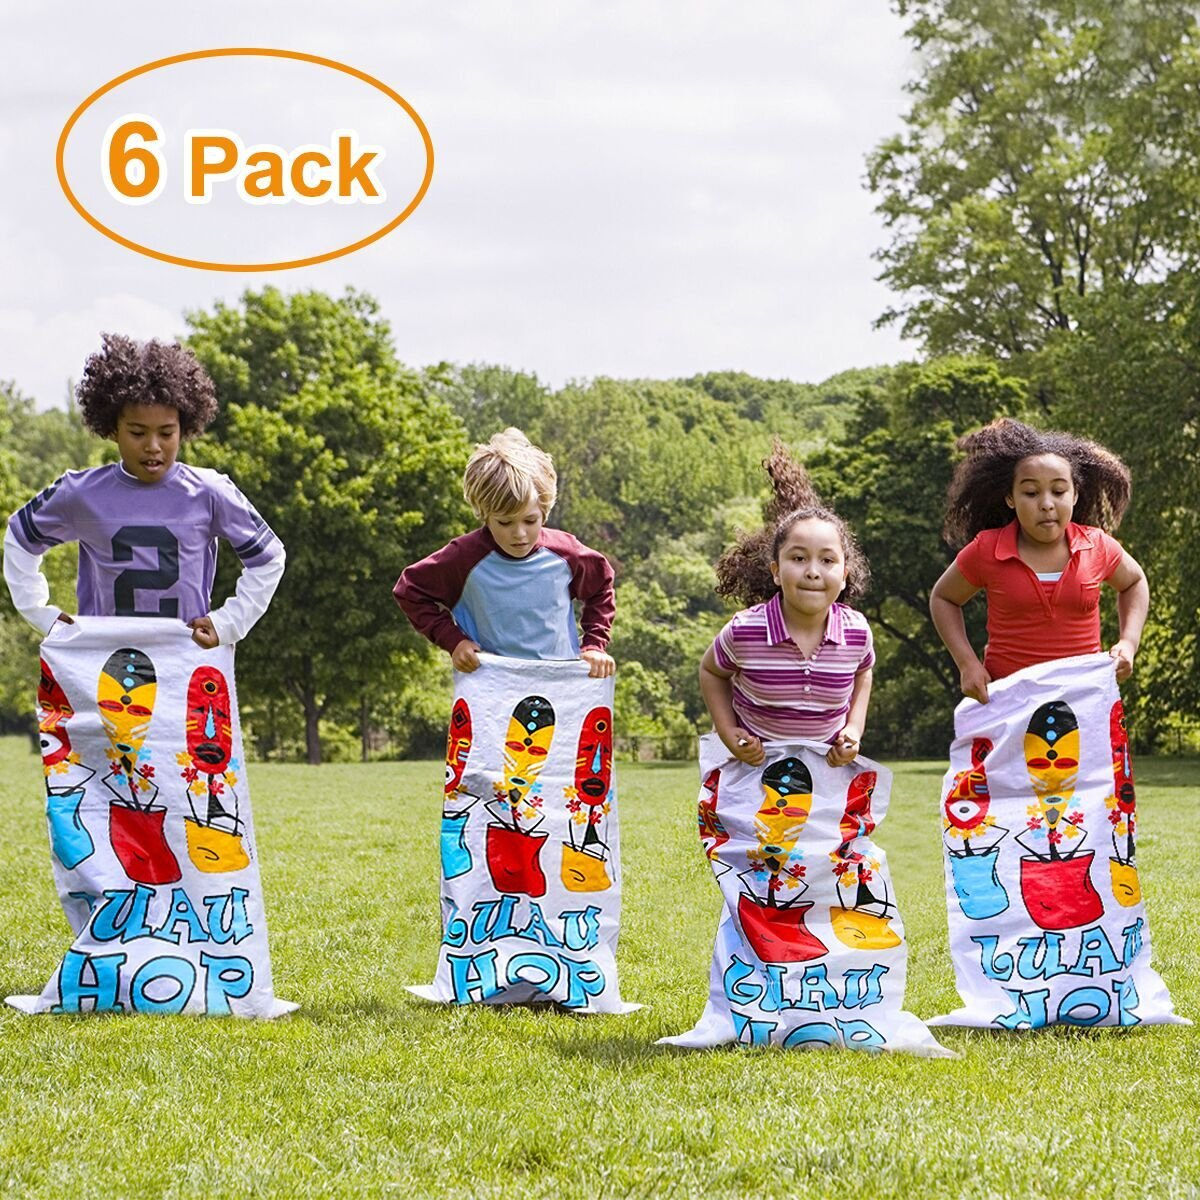 iBaseToy Potato Sack Race Bags 24''x41'' (6 PCS) - Luau Hop Party Game Birthday Party Games